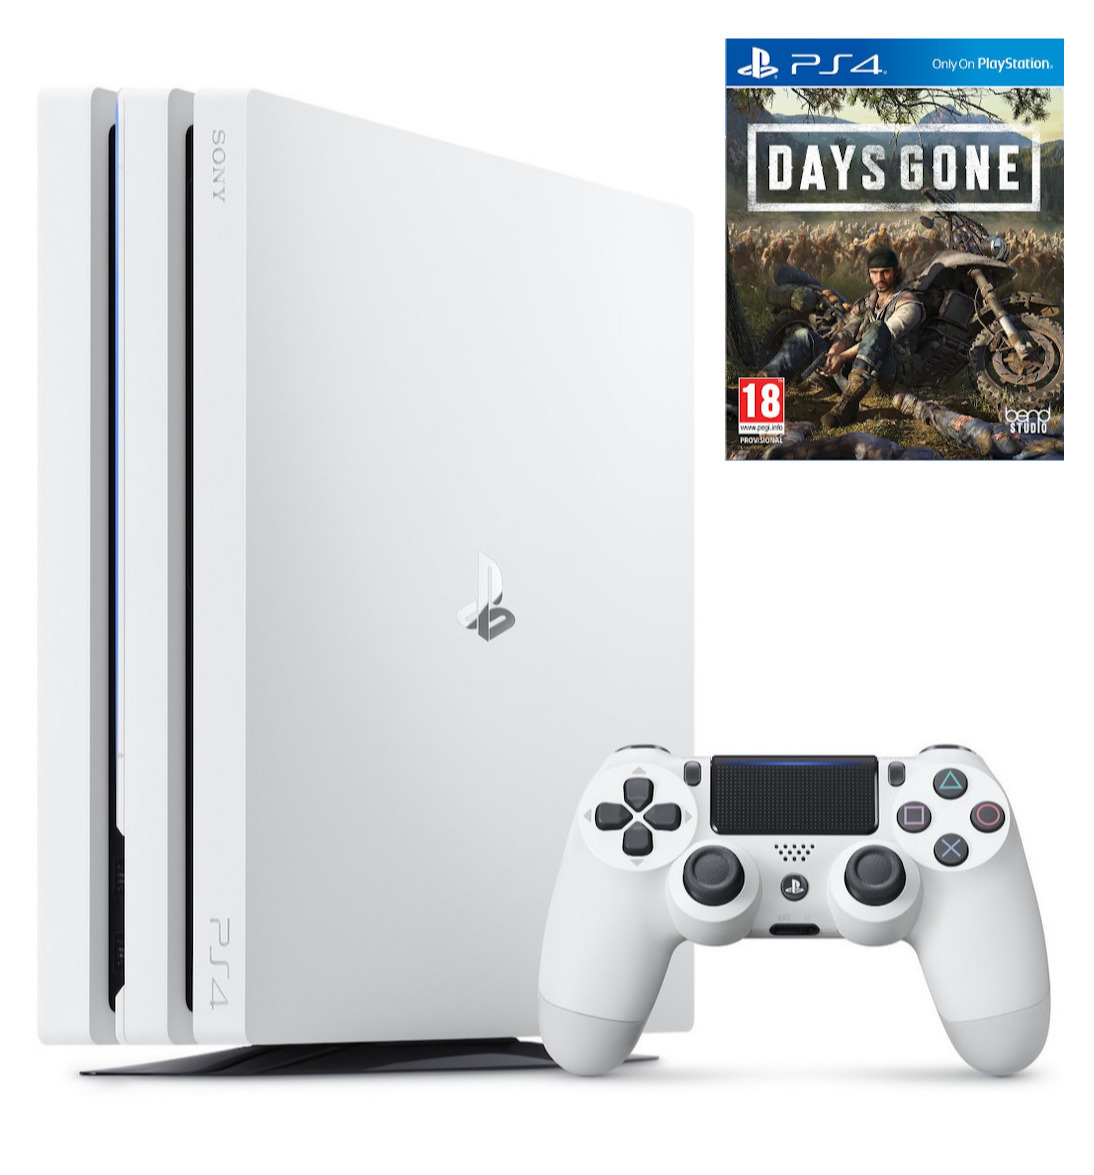 Konzole PlayStation 4 Pro 1TB - Glacier White + Days Gone (PS4)